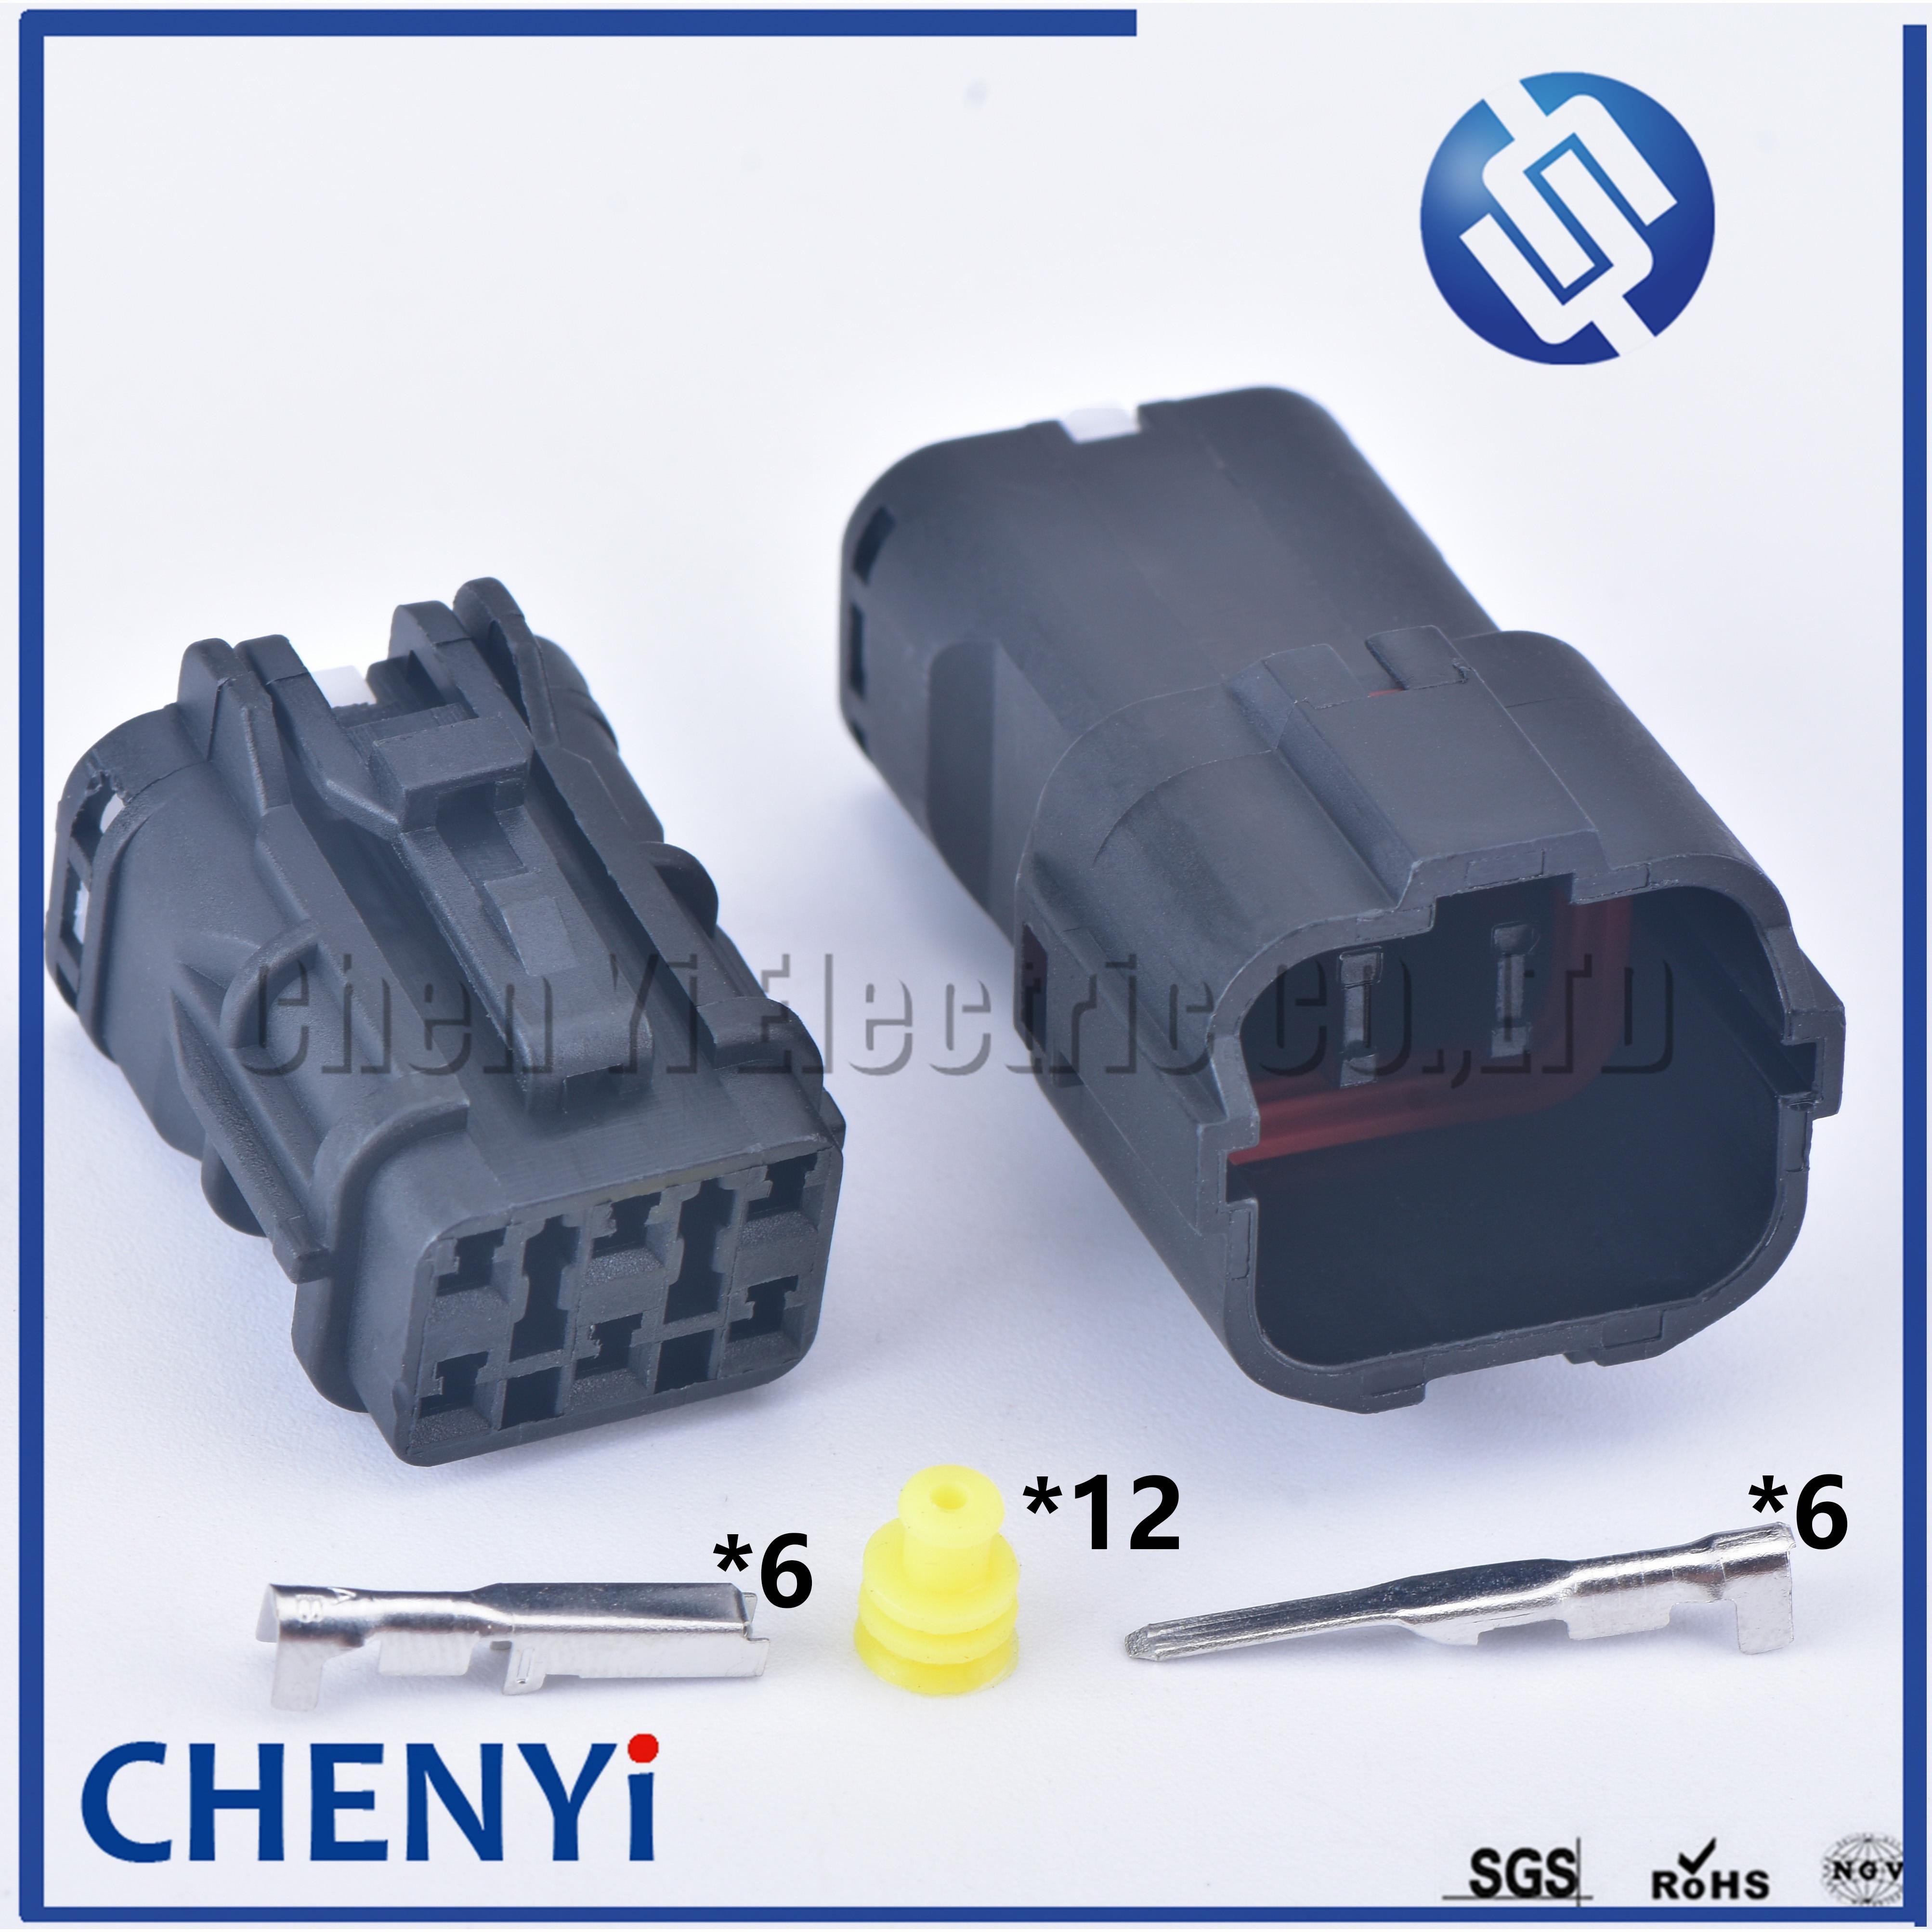 2 conjuntos preto 6 pinos ket fêmea masculino mg640337 mg610335 automotivo impermeável ecu fio elétrico conector plug 7222-7484-40